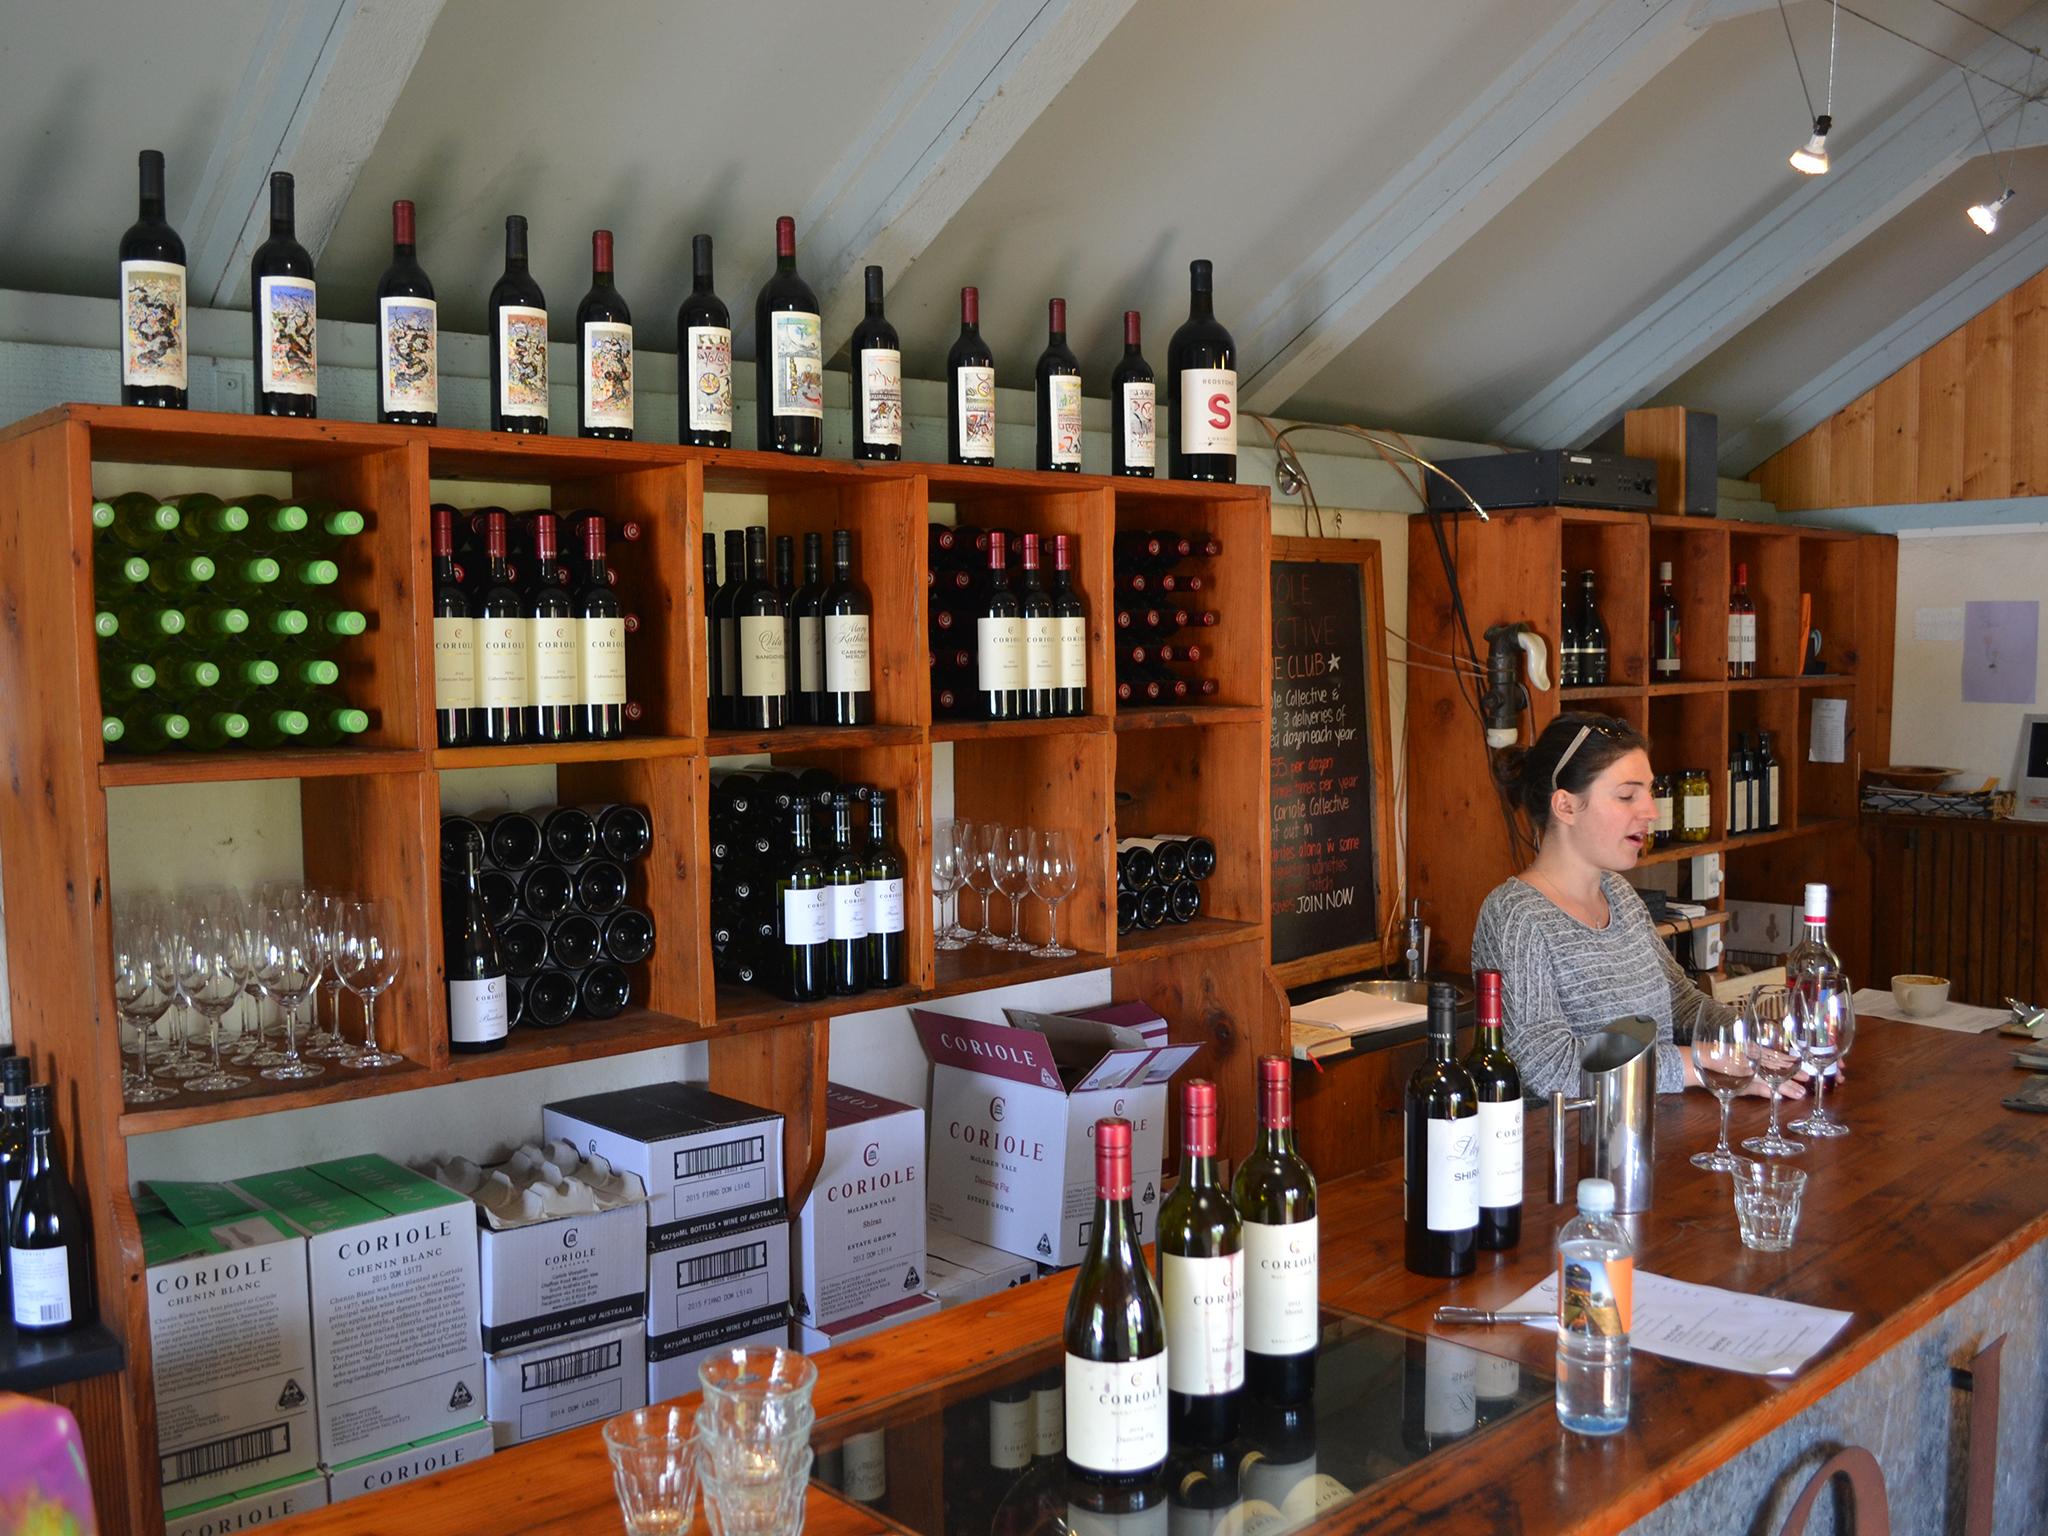 Coriole Wines